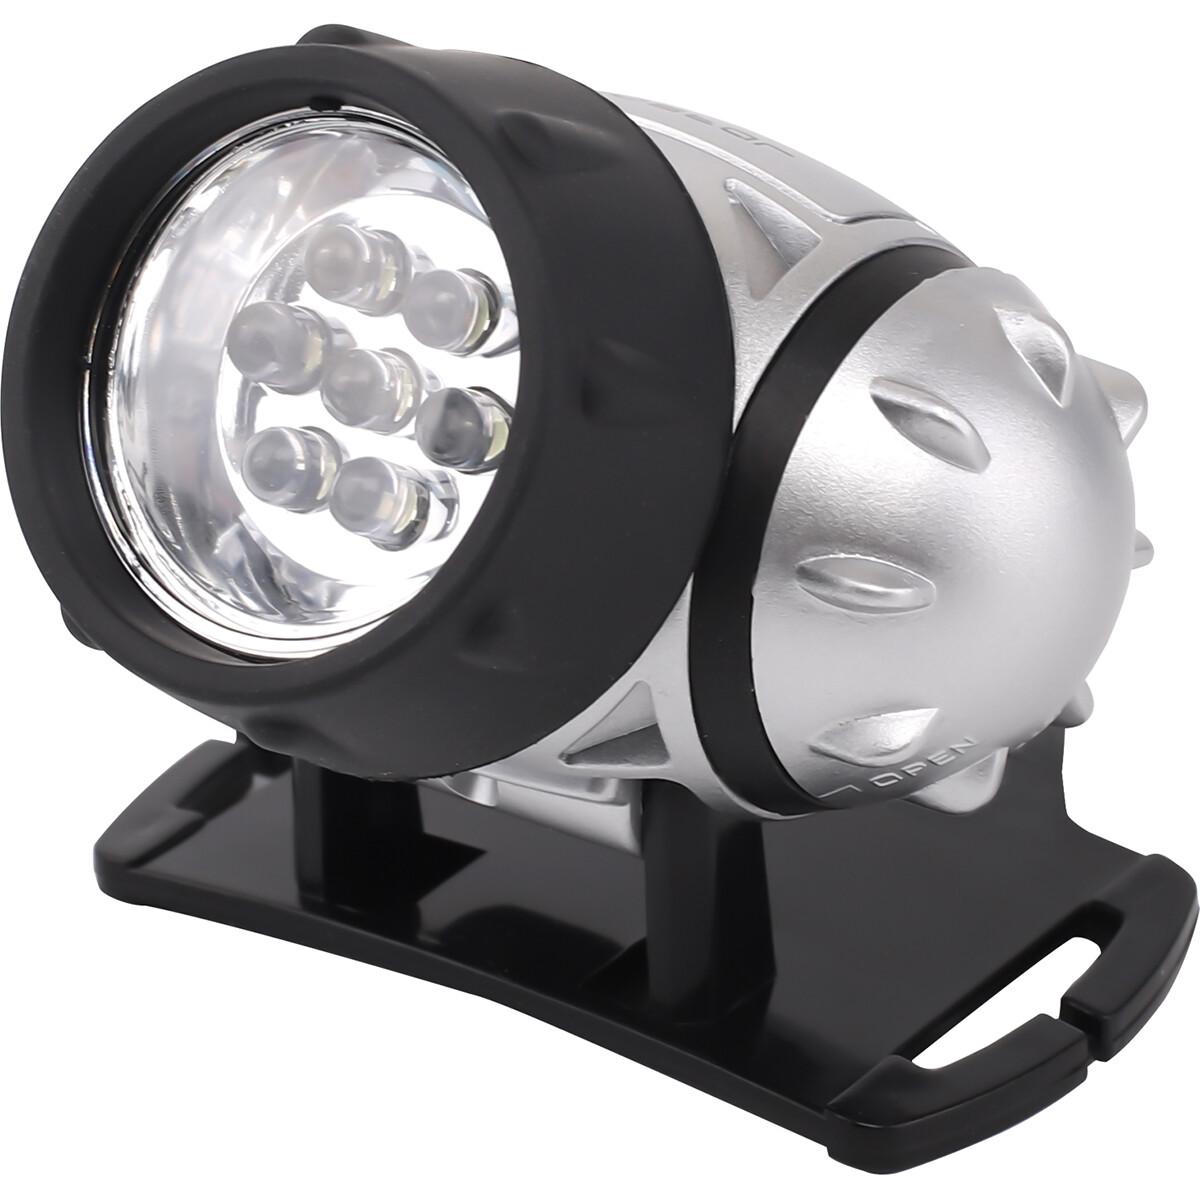 LED Hoofdlamp - Aigi Heady - Waterdicht - 20 Meter - Kantelbaar - 7 LED's - 0.54W - Zilver | Vervang